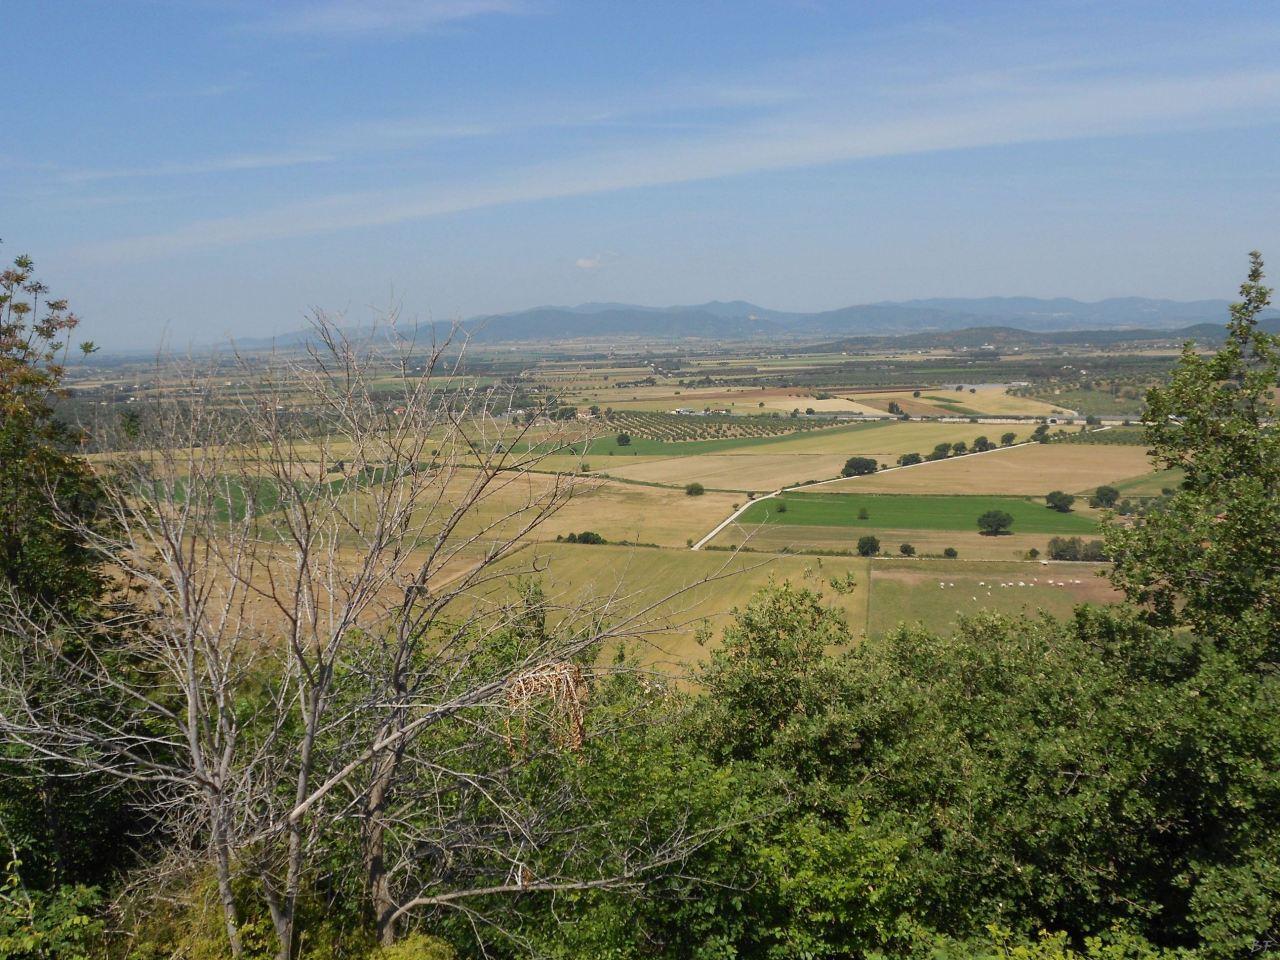 Roselle-Mura-Megalitiche-Roselle-Grosseto-Toscana-Italia-14